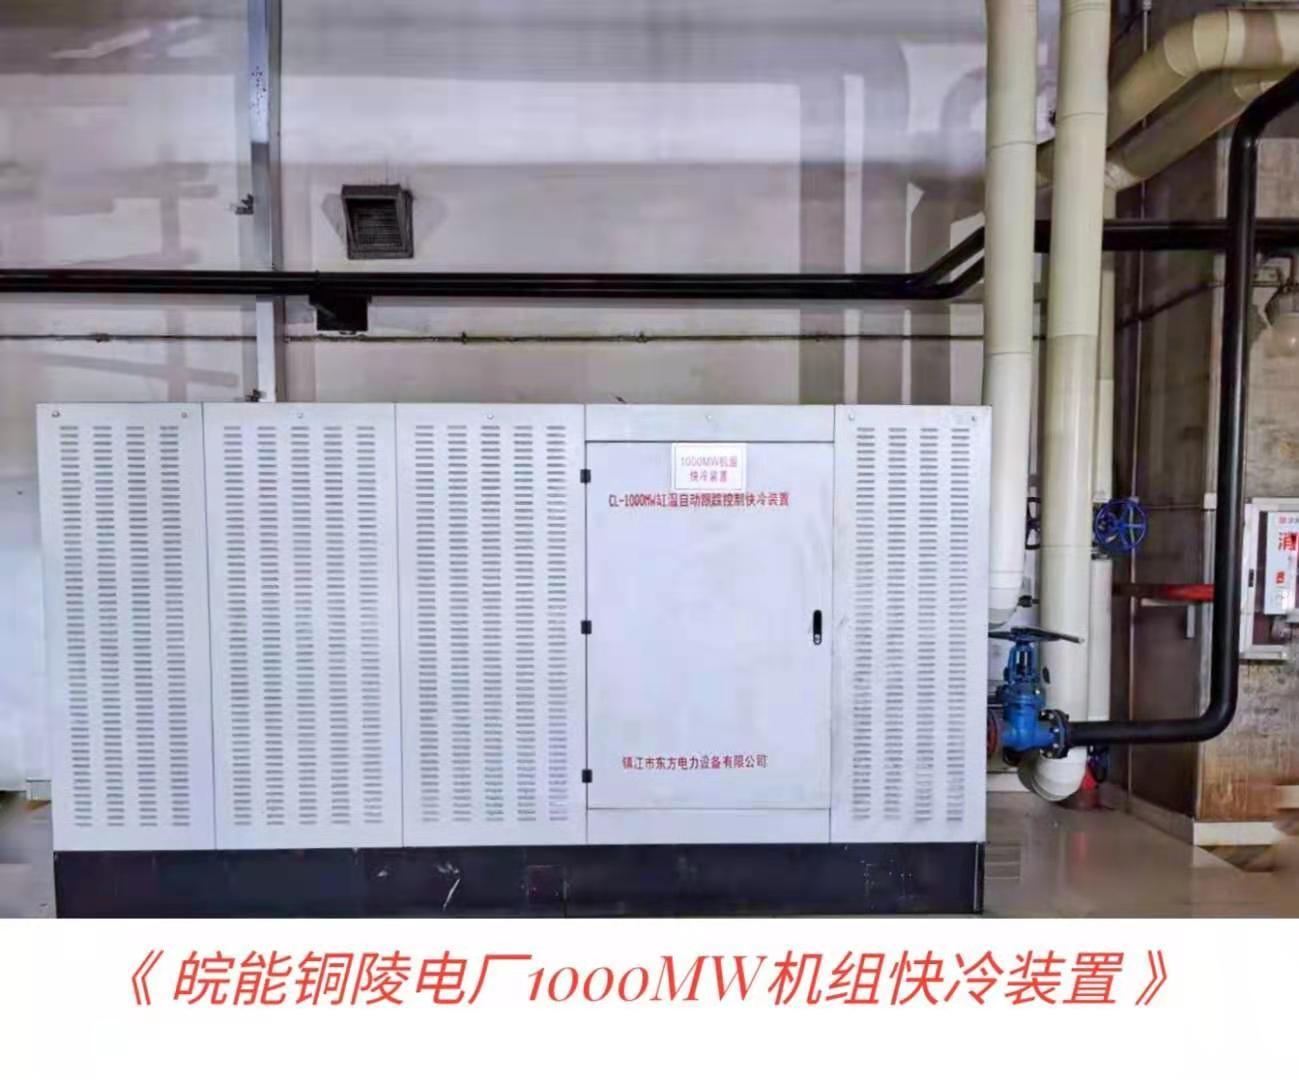 CL-1000MW缸温自动跟踪控制快冷装置